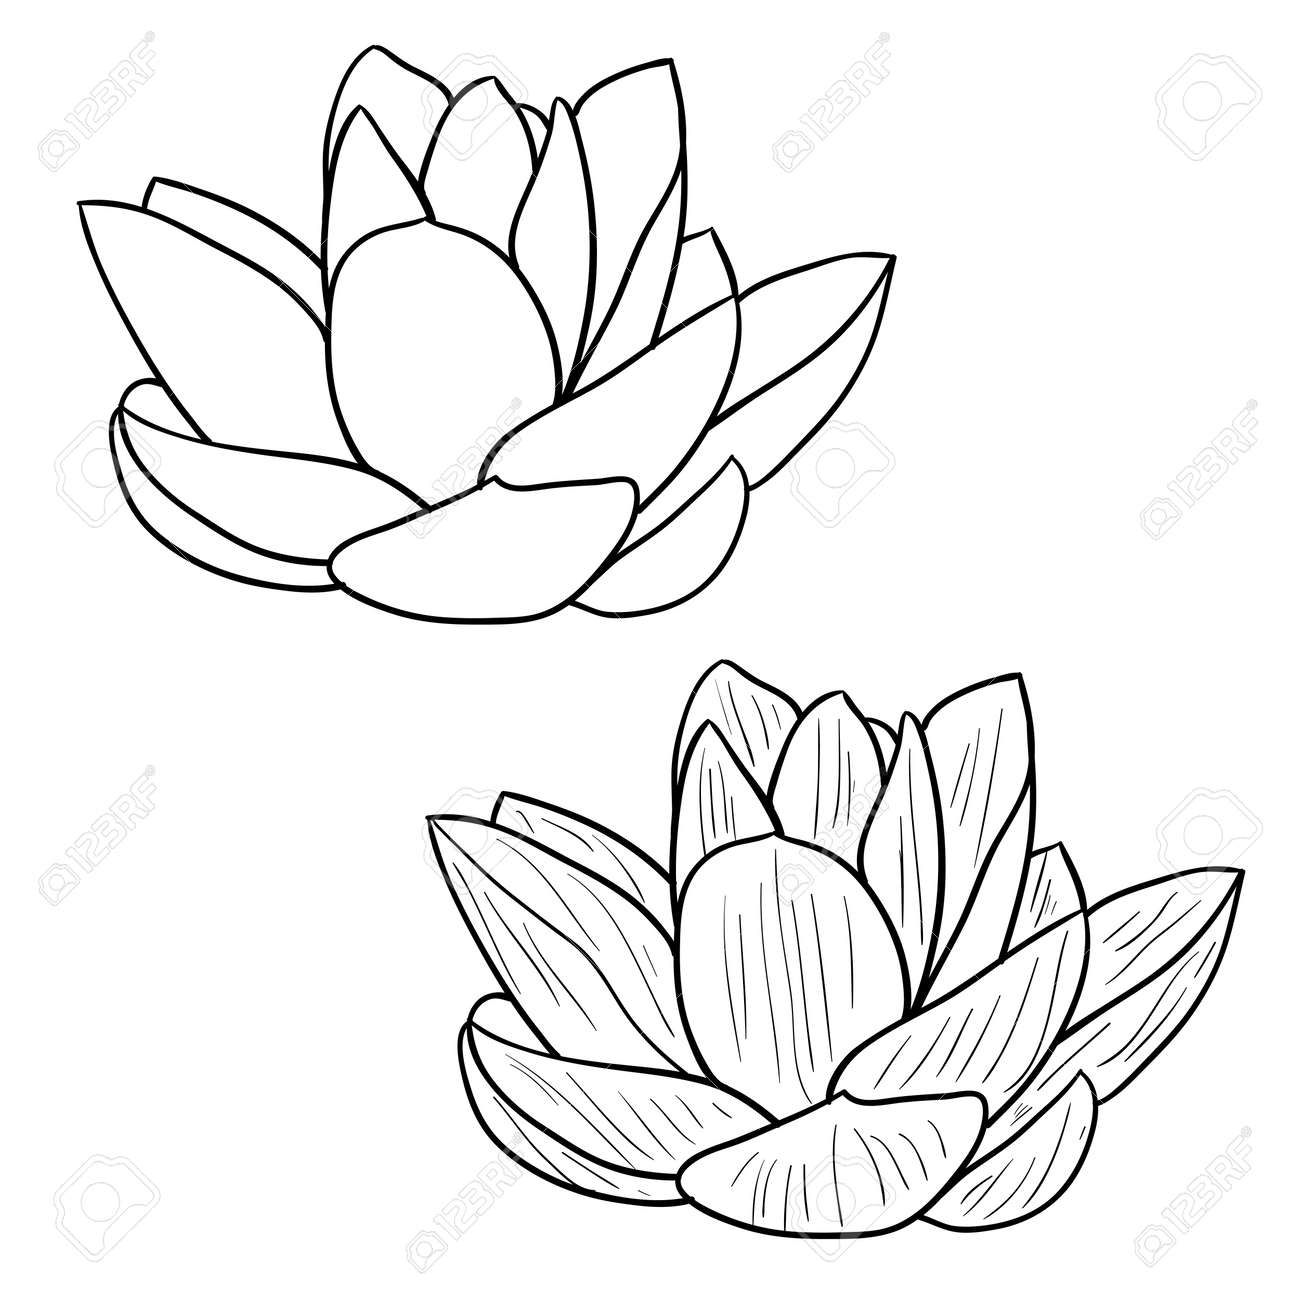 Oriental lotus - a flower Vector illustration. Stock Vector - 12481853